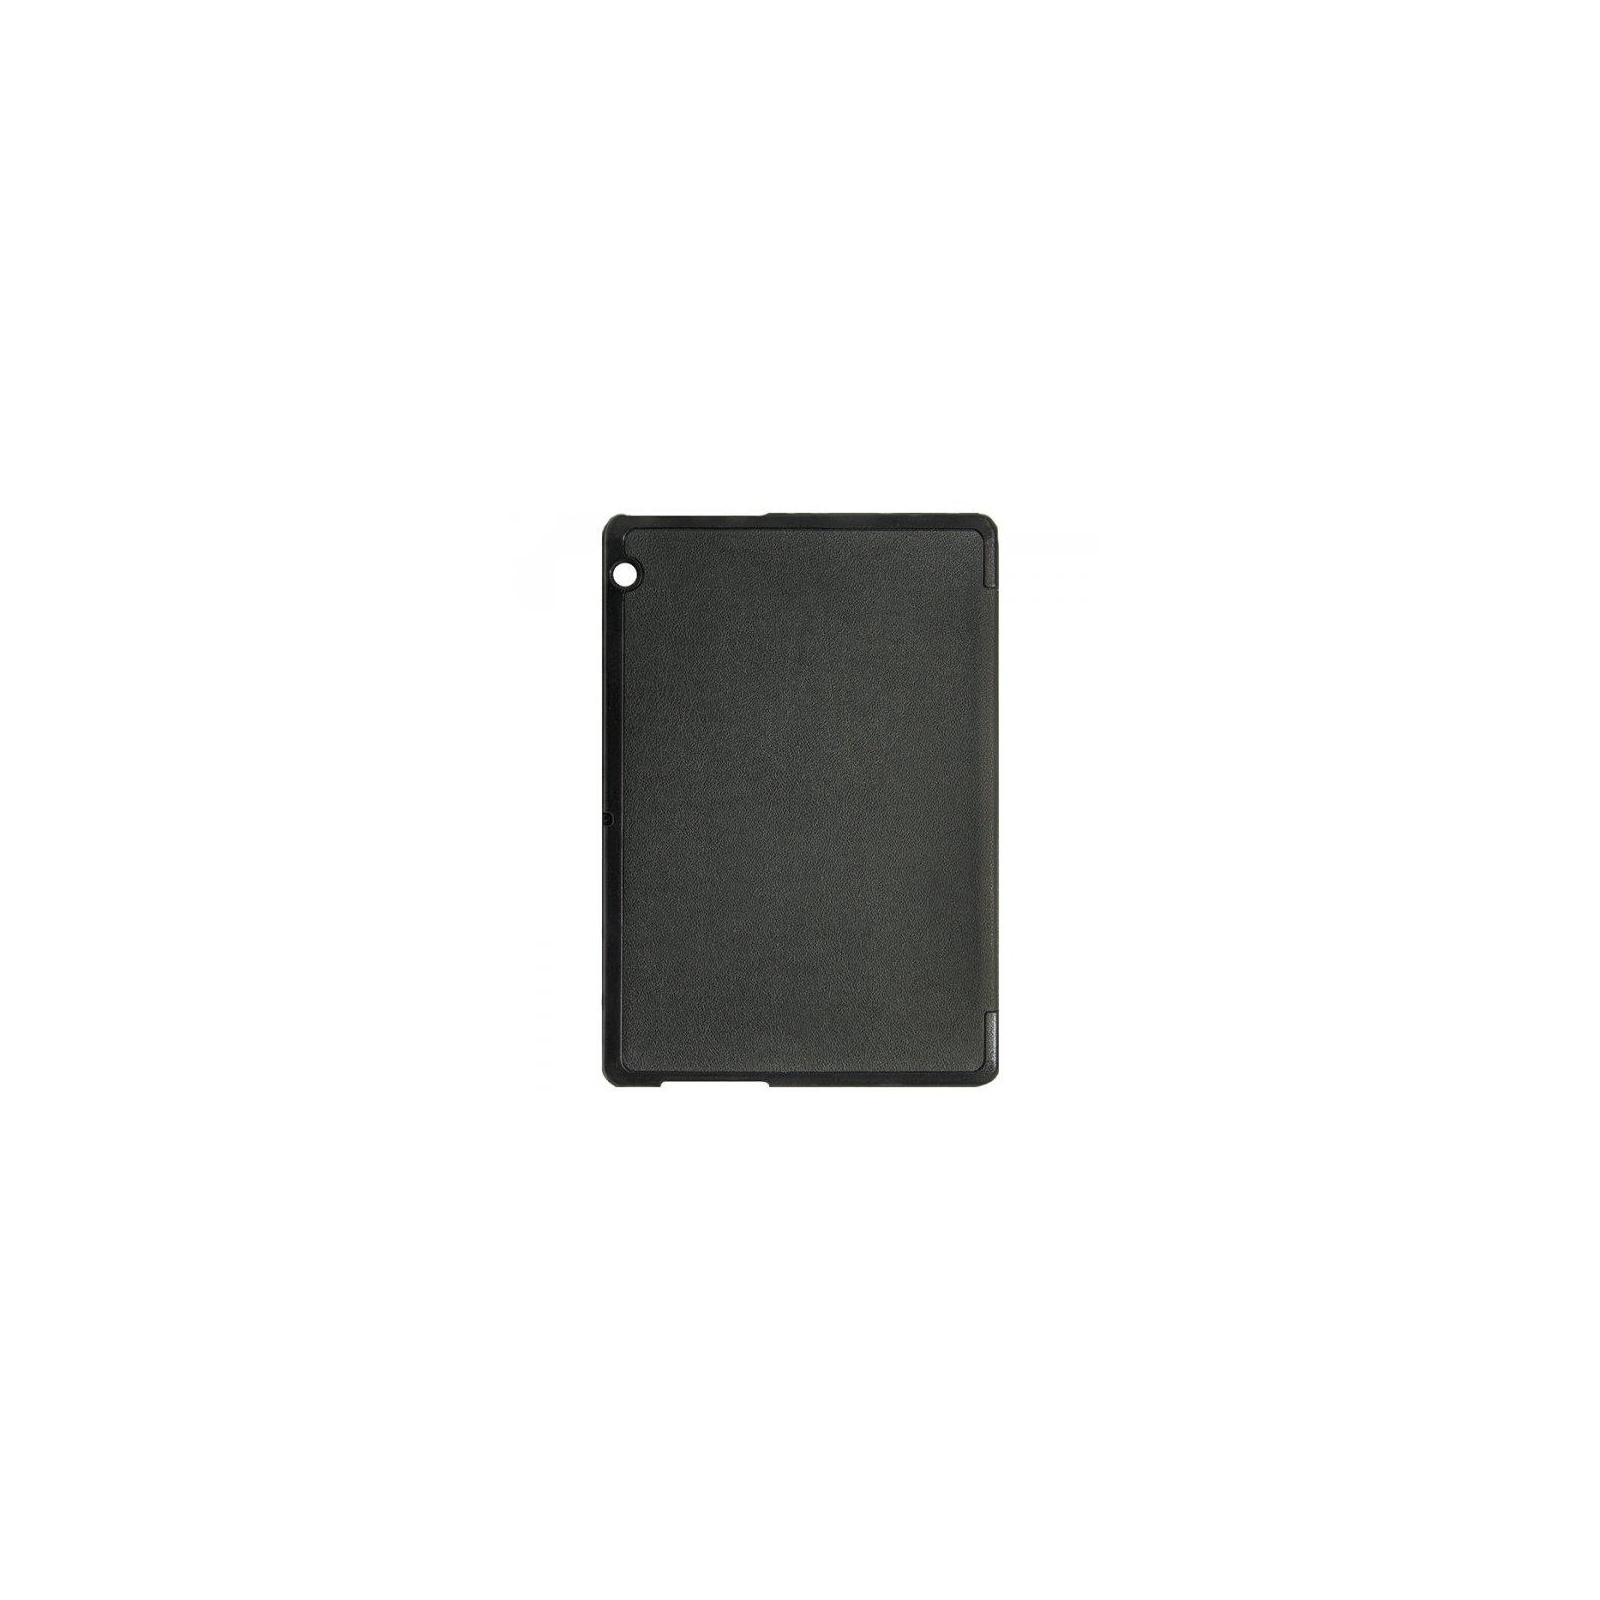 Чехол для планшета Grand-X для Huawei T3-10 Black (HTC-HT310B) изображение 2